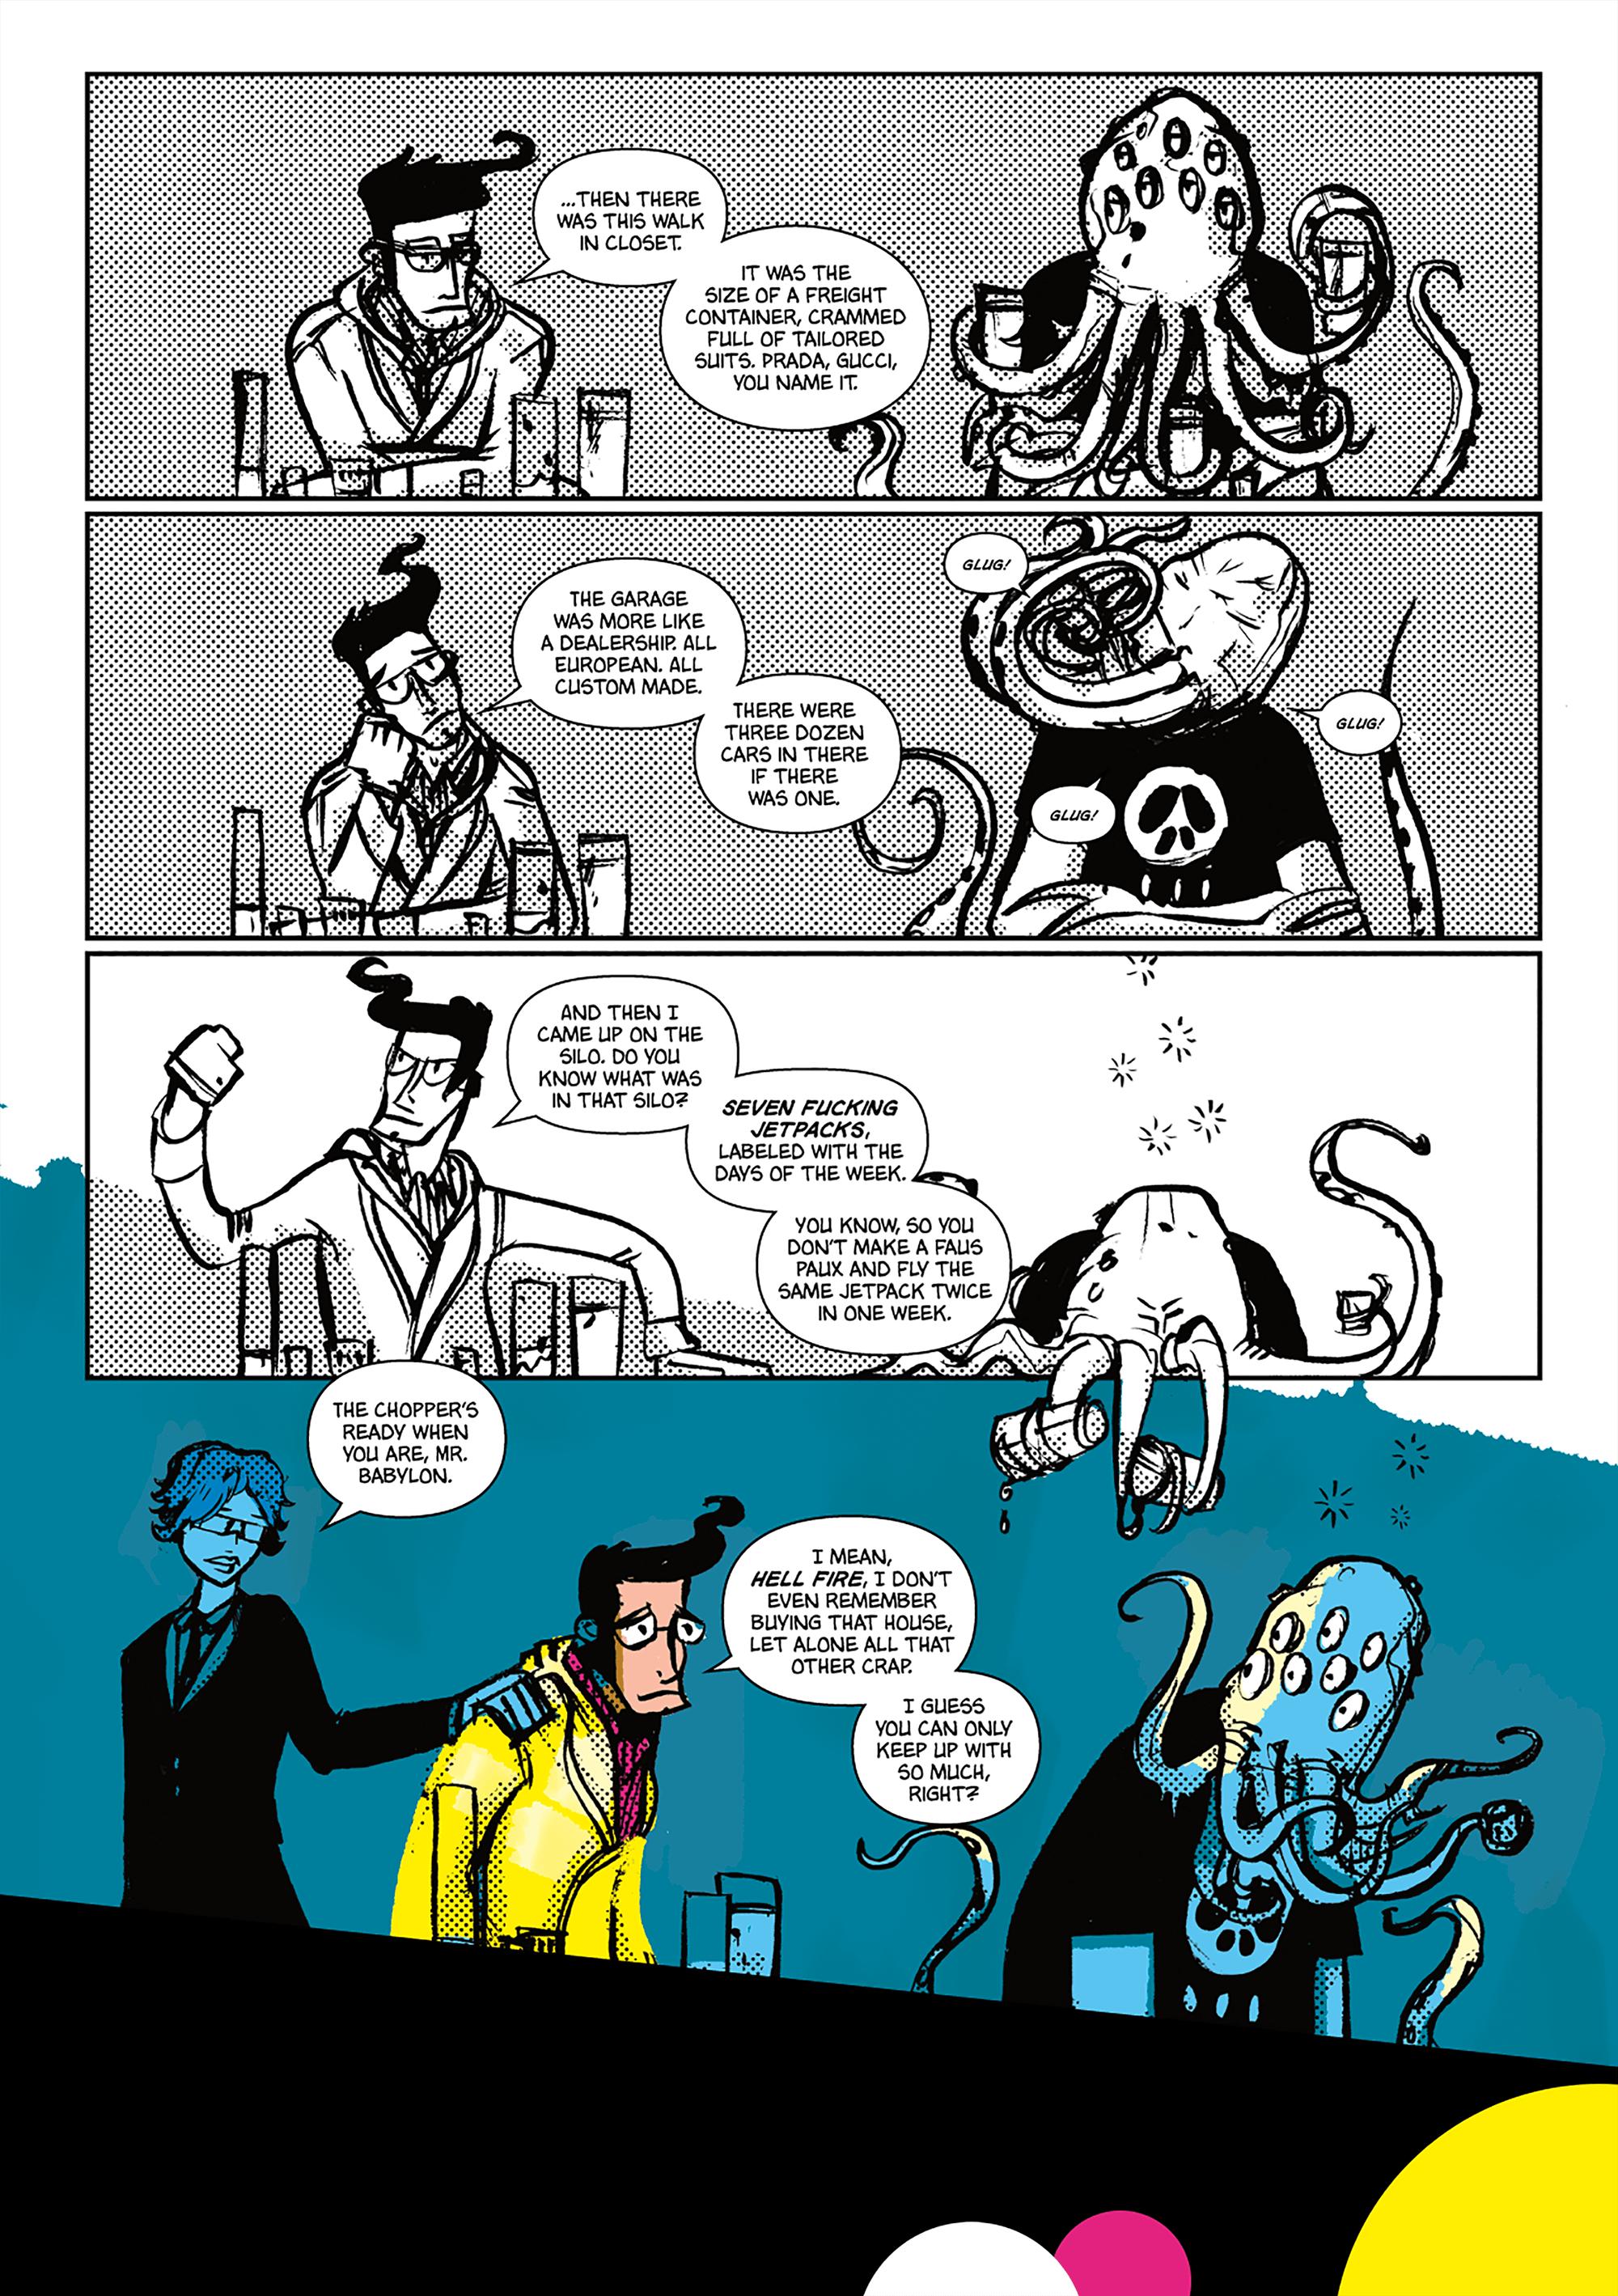 Randy Babylon page 1